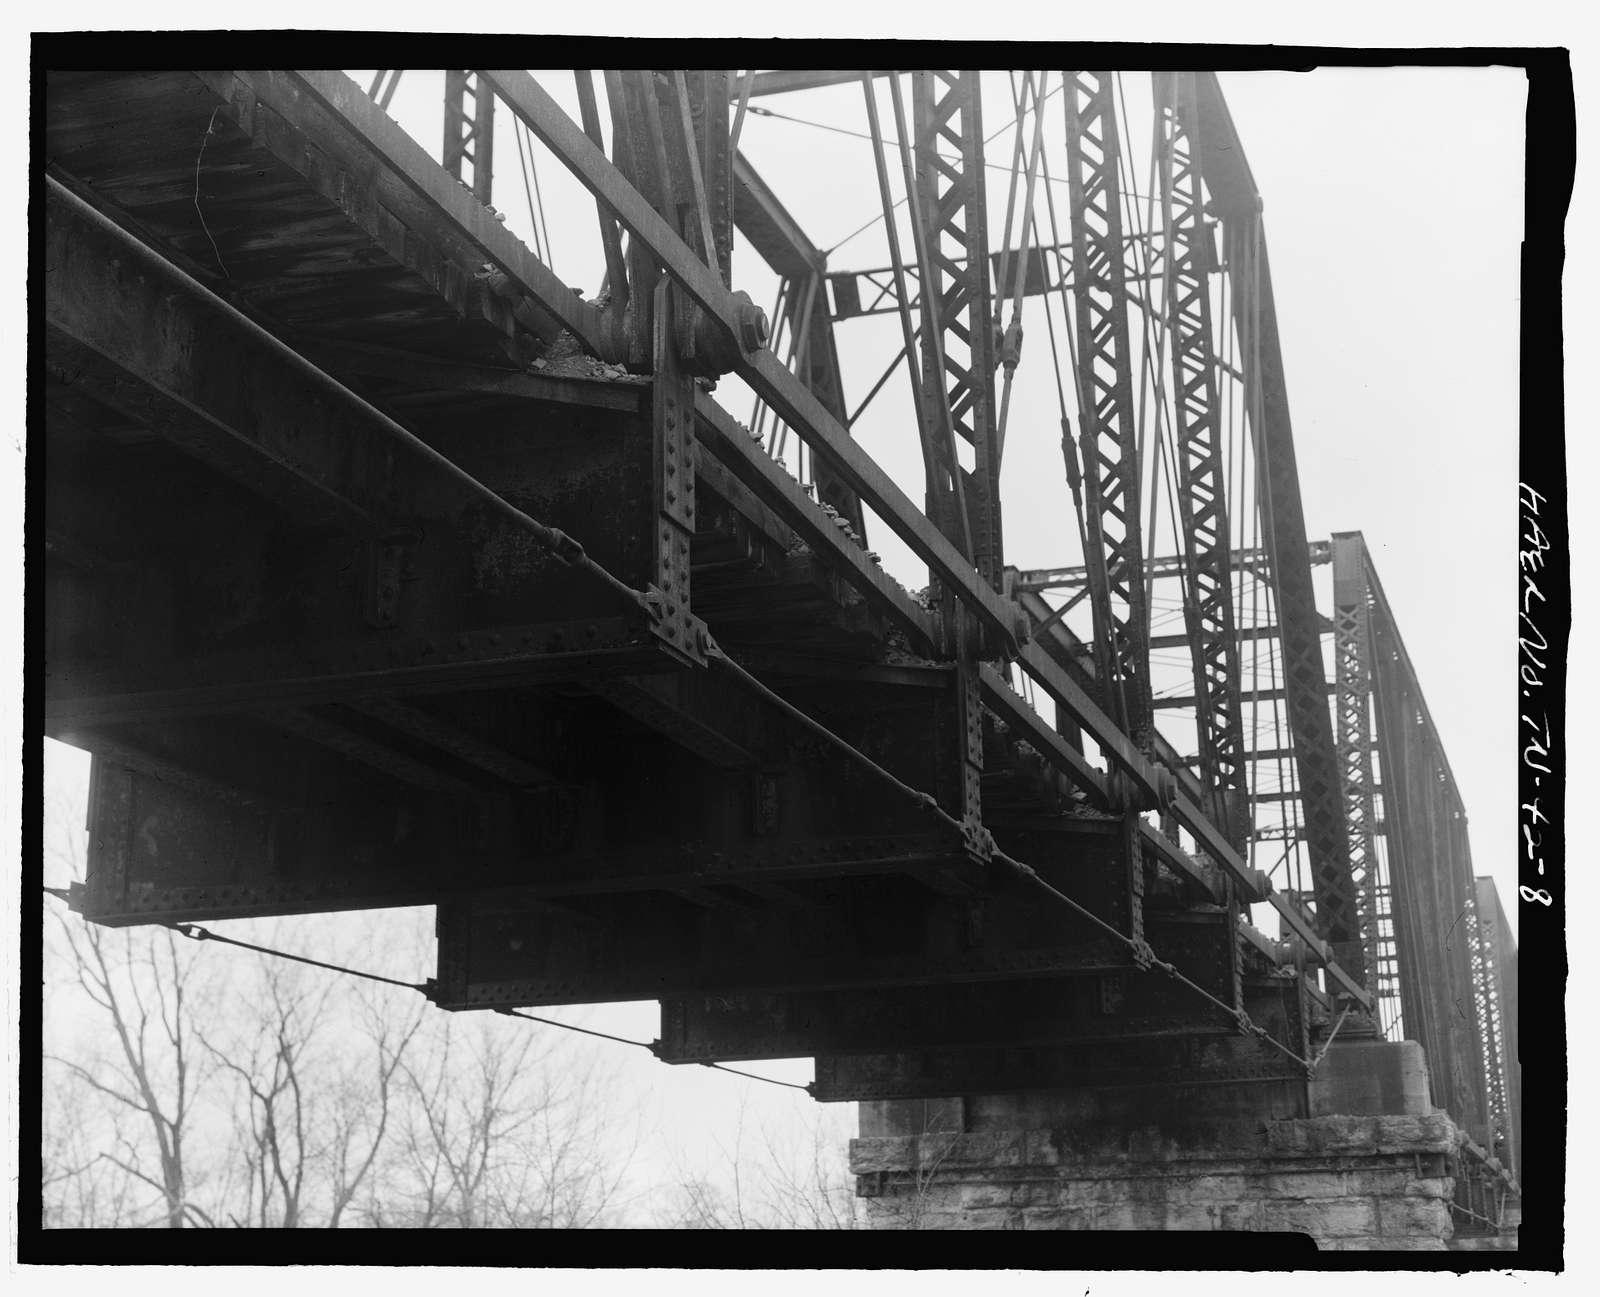 Bridge No. 33.3, Spanning Elk River at Milepost JC-33.3, Fayetteville, Lincoln County, TN